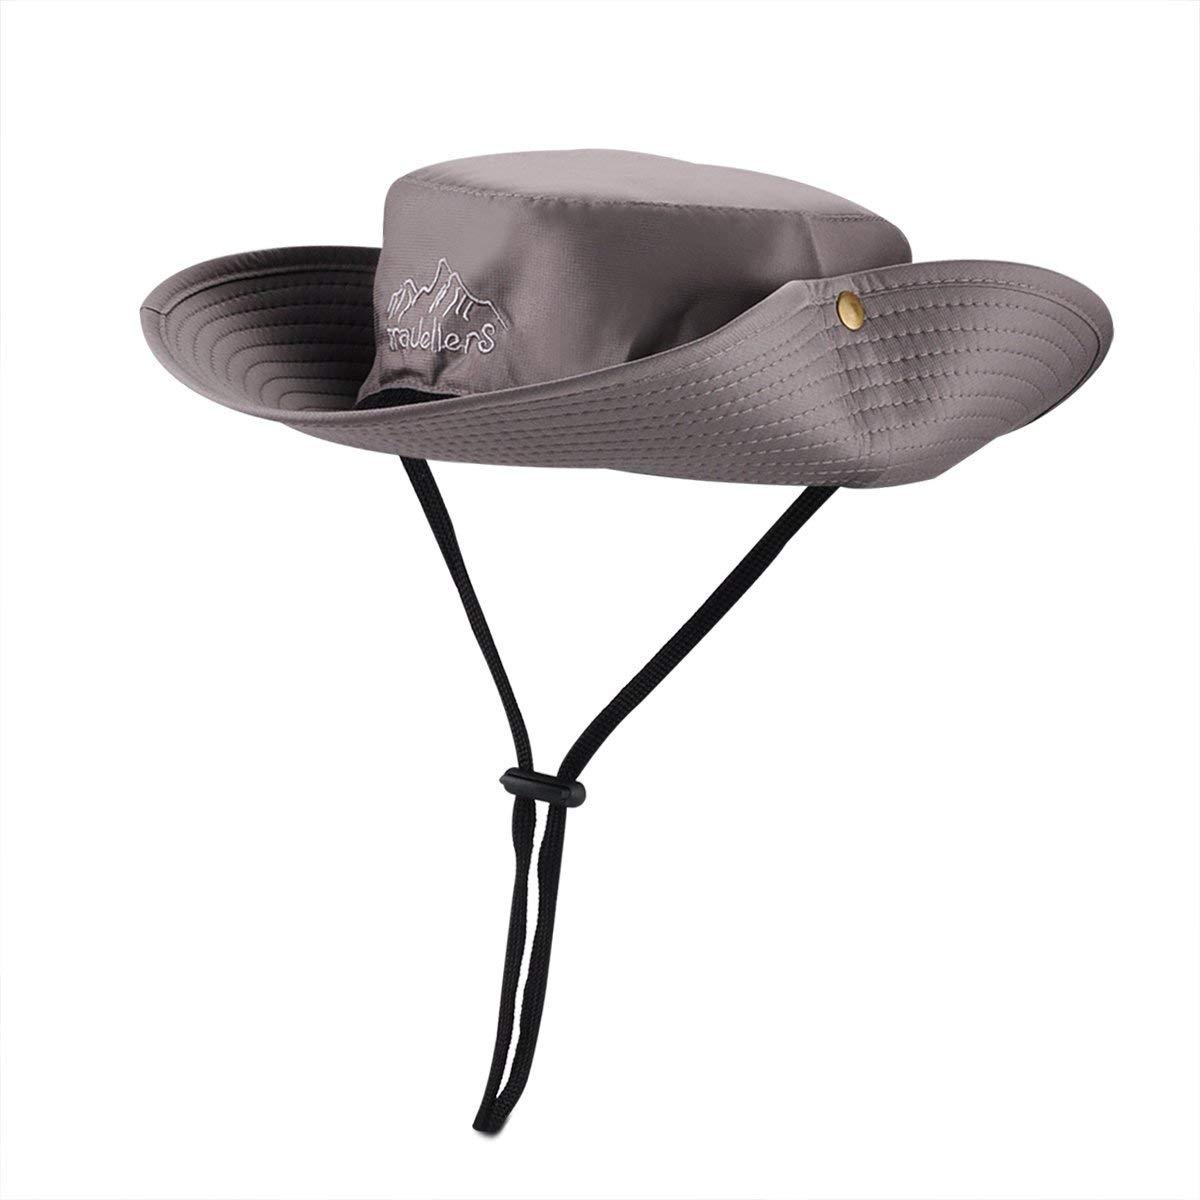 18b8ba6b5a6b5 Get Quotations · Wide Brim Waterproof Boonie Fishing Hat